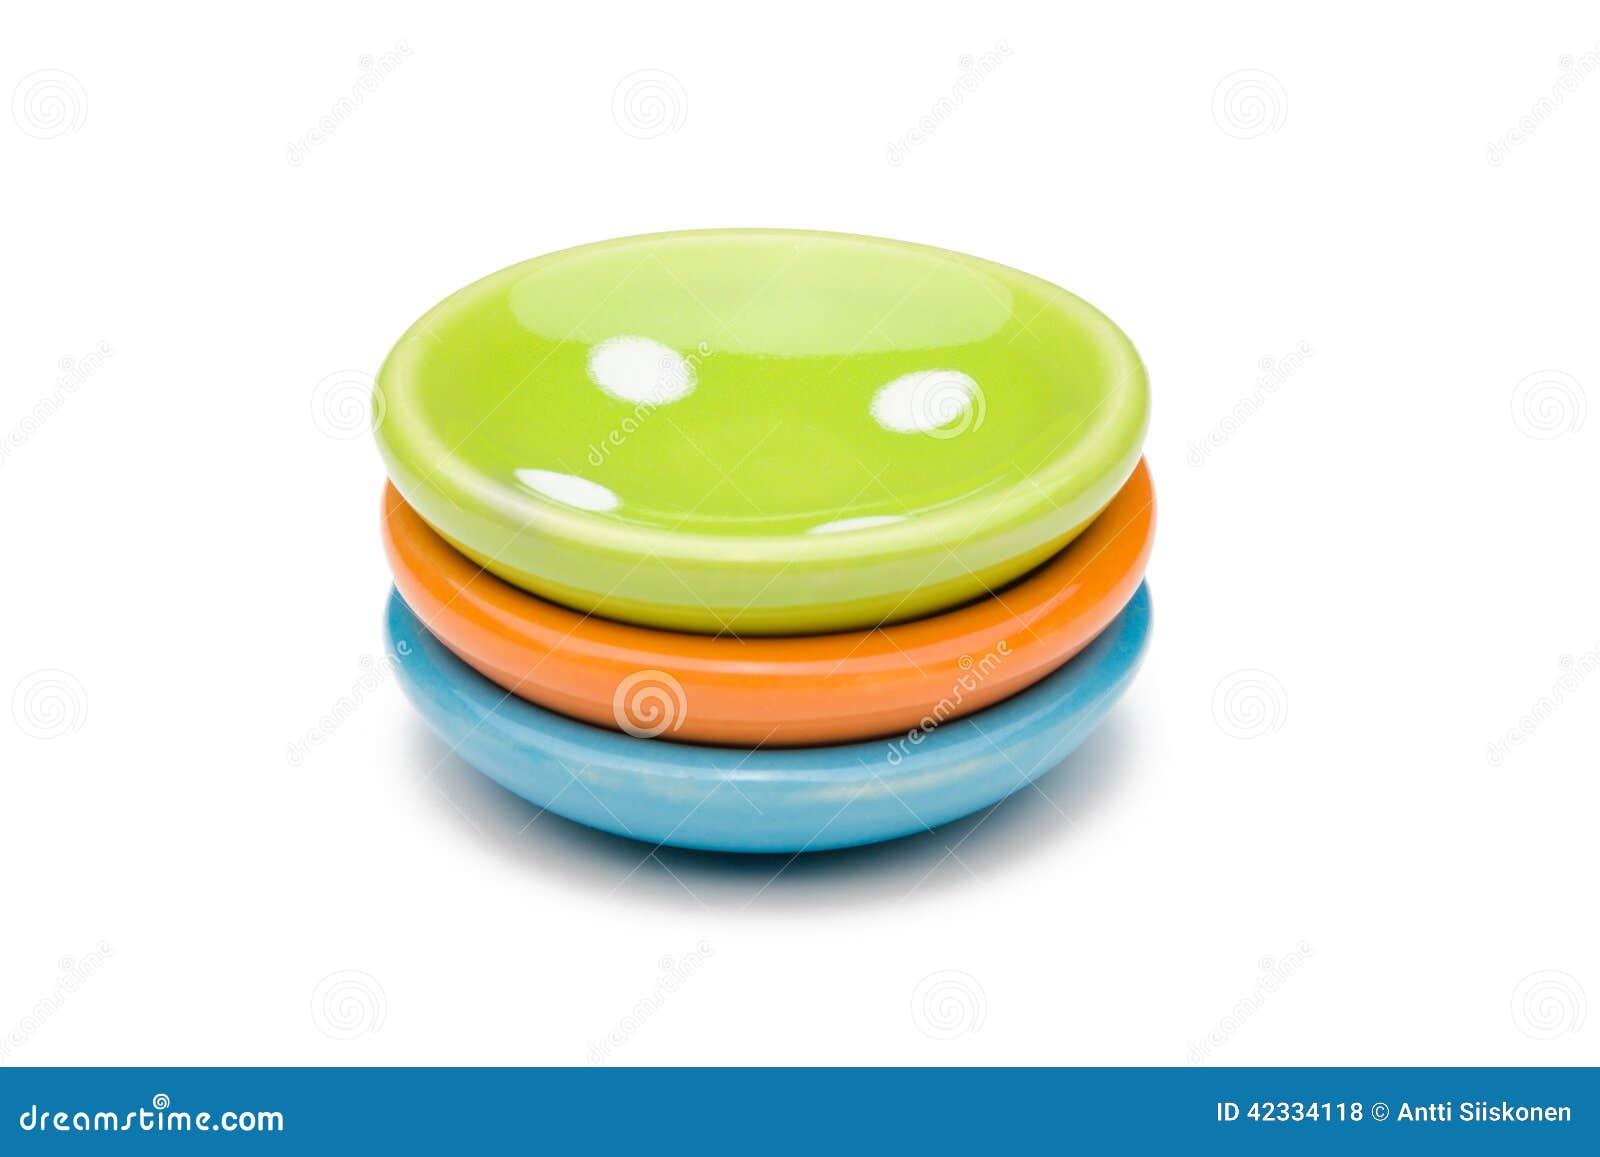 Toys Plates 31